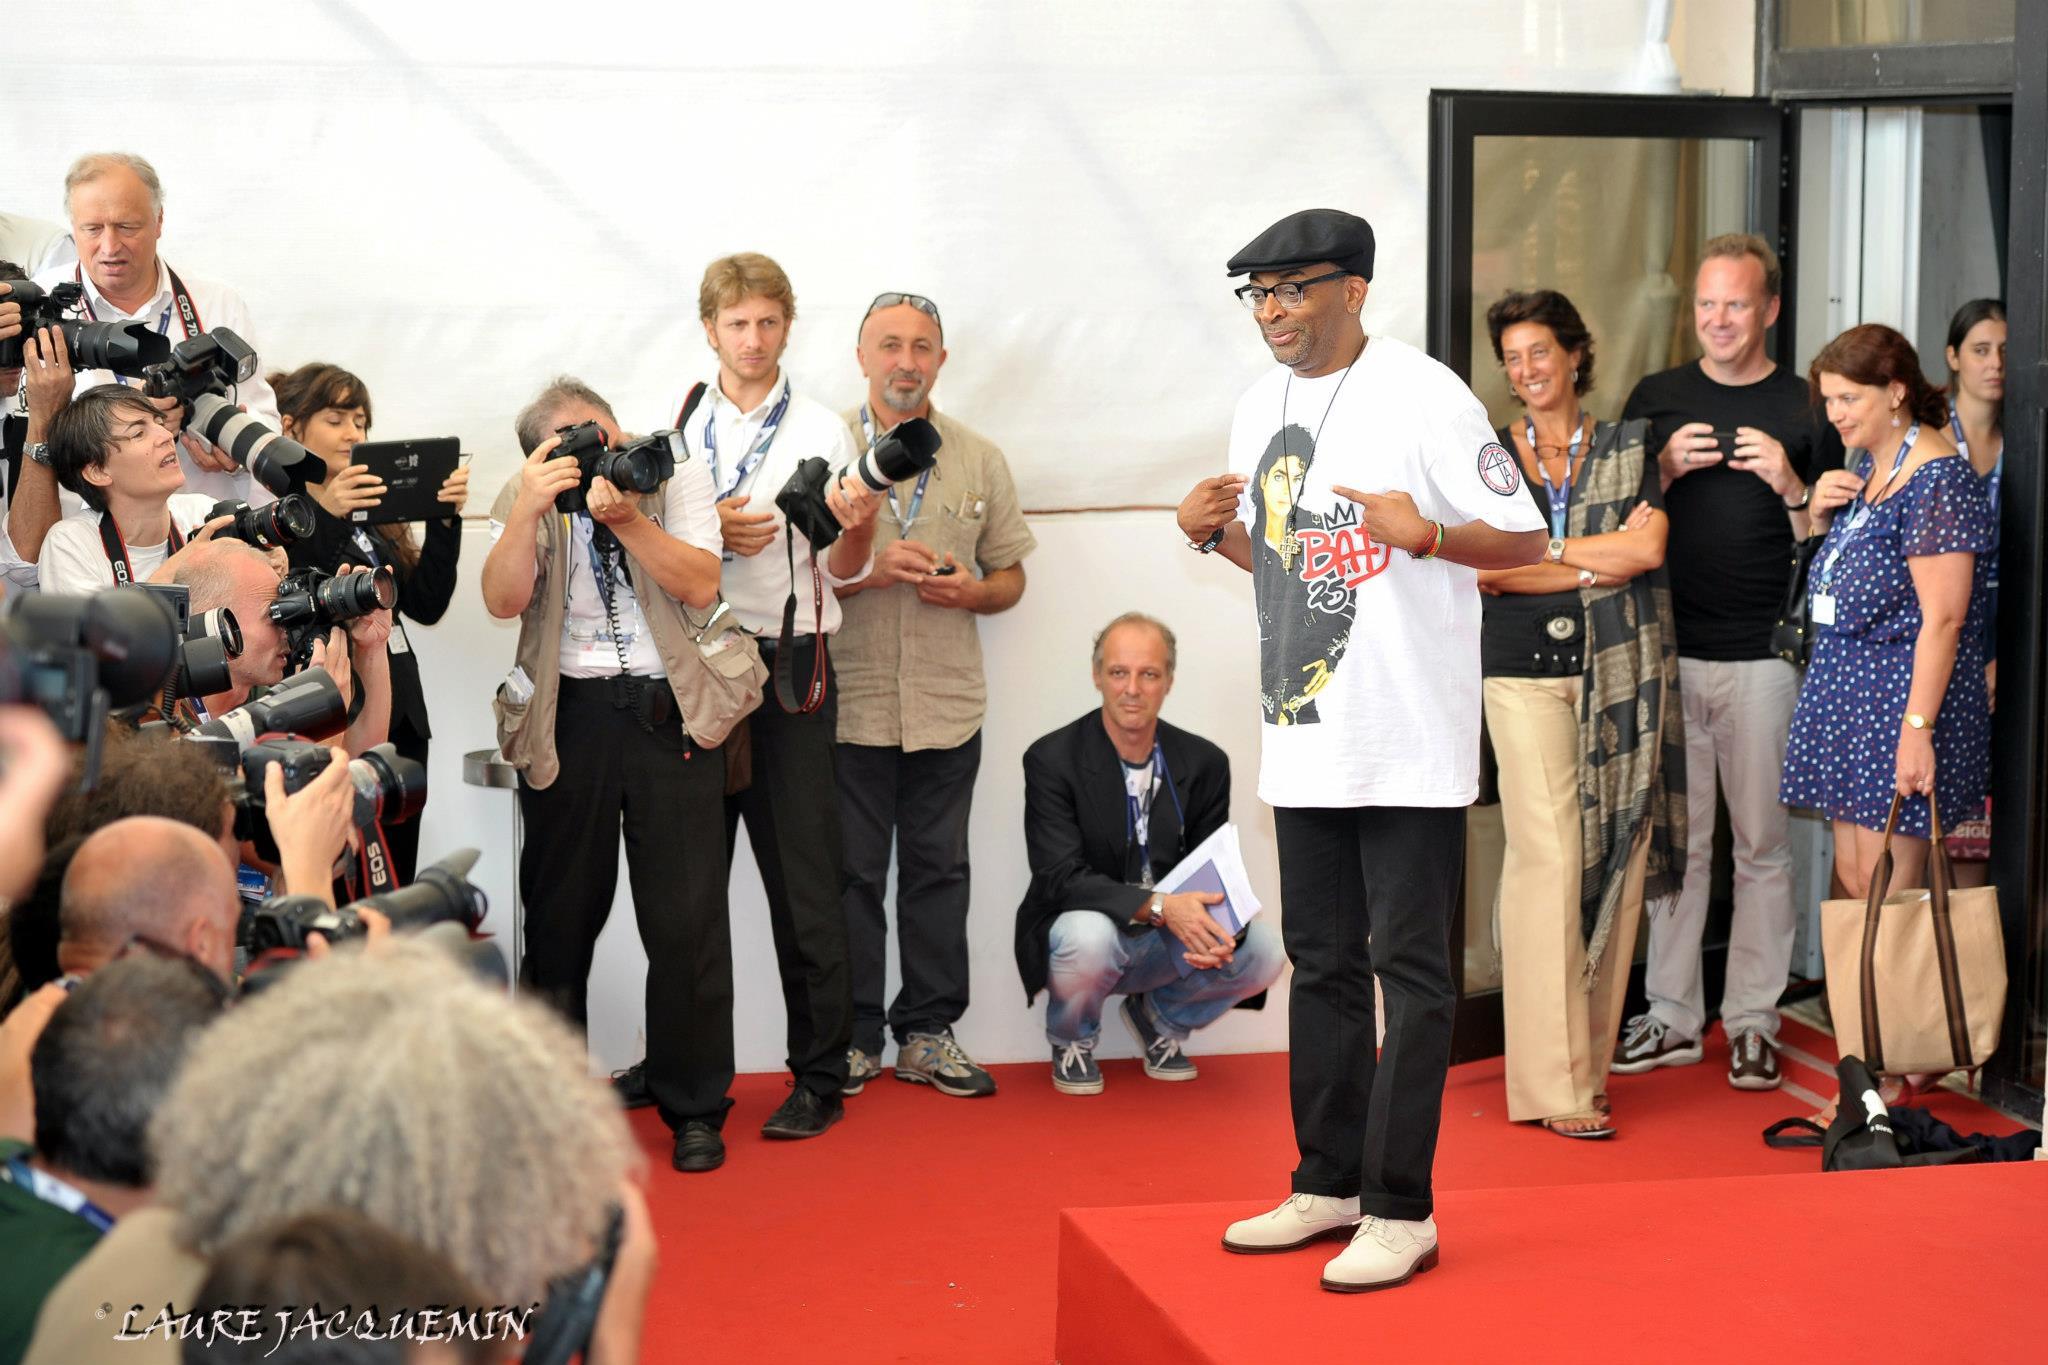 venice film festival venice laure jacquemin (66).jpg